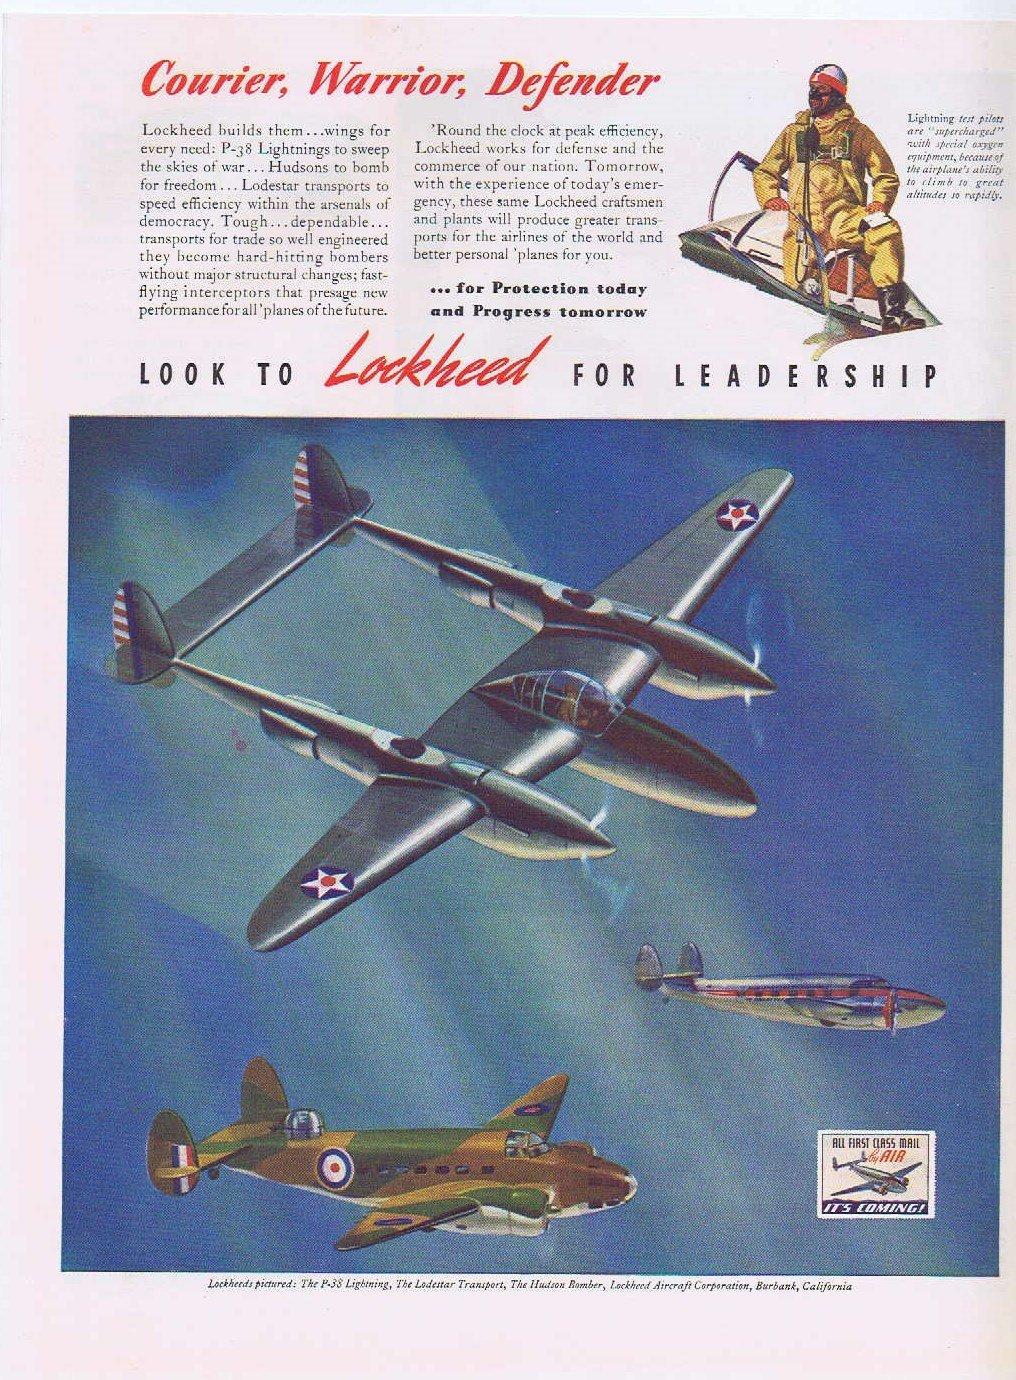 1941 Lockheed Military Planes Vintage Ad P-38 Lighting, Hudson Bomber Lodestar Transport